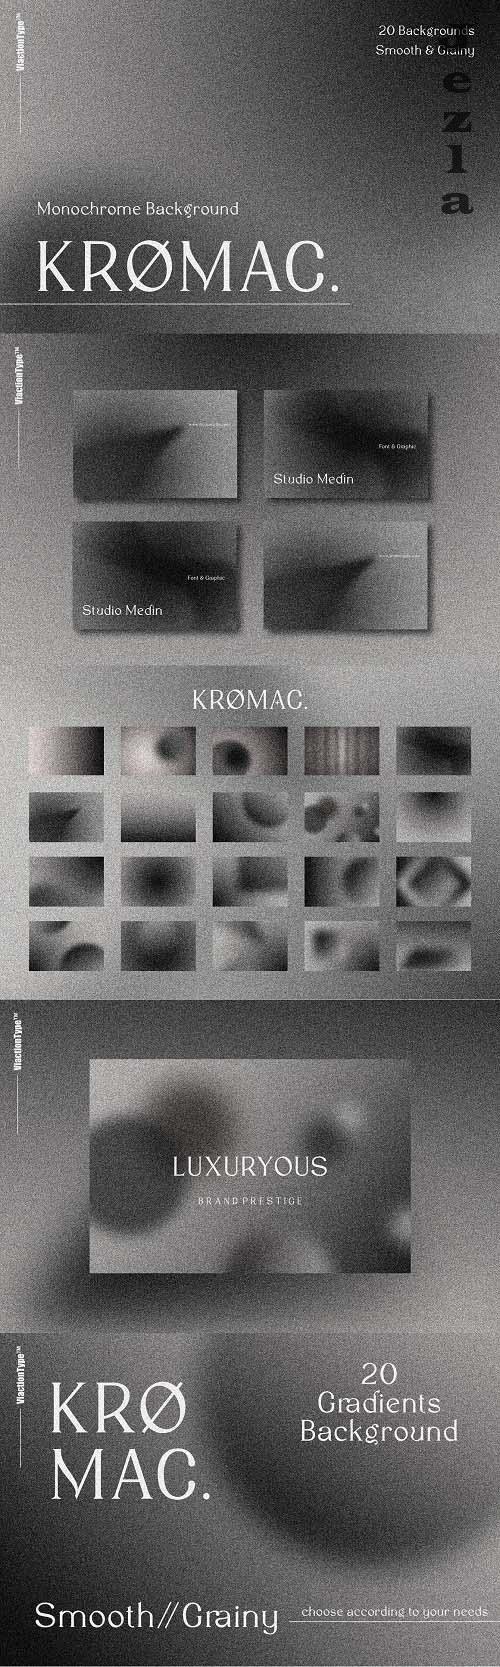 Kromac - Monochrome Background - 6580217